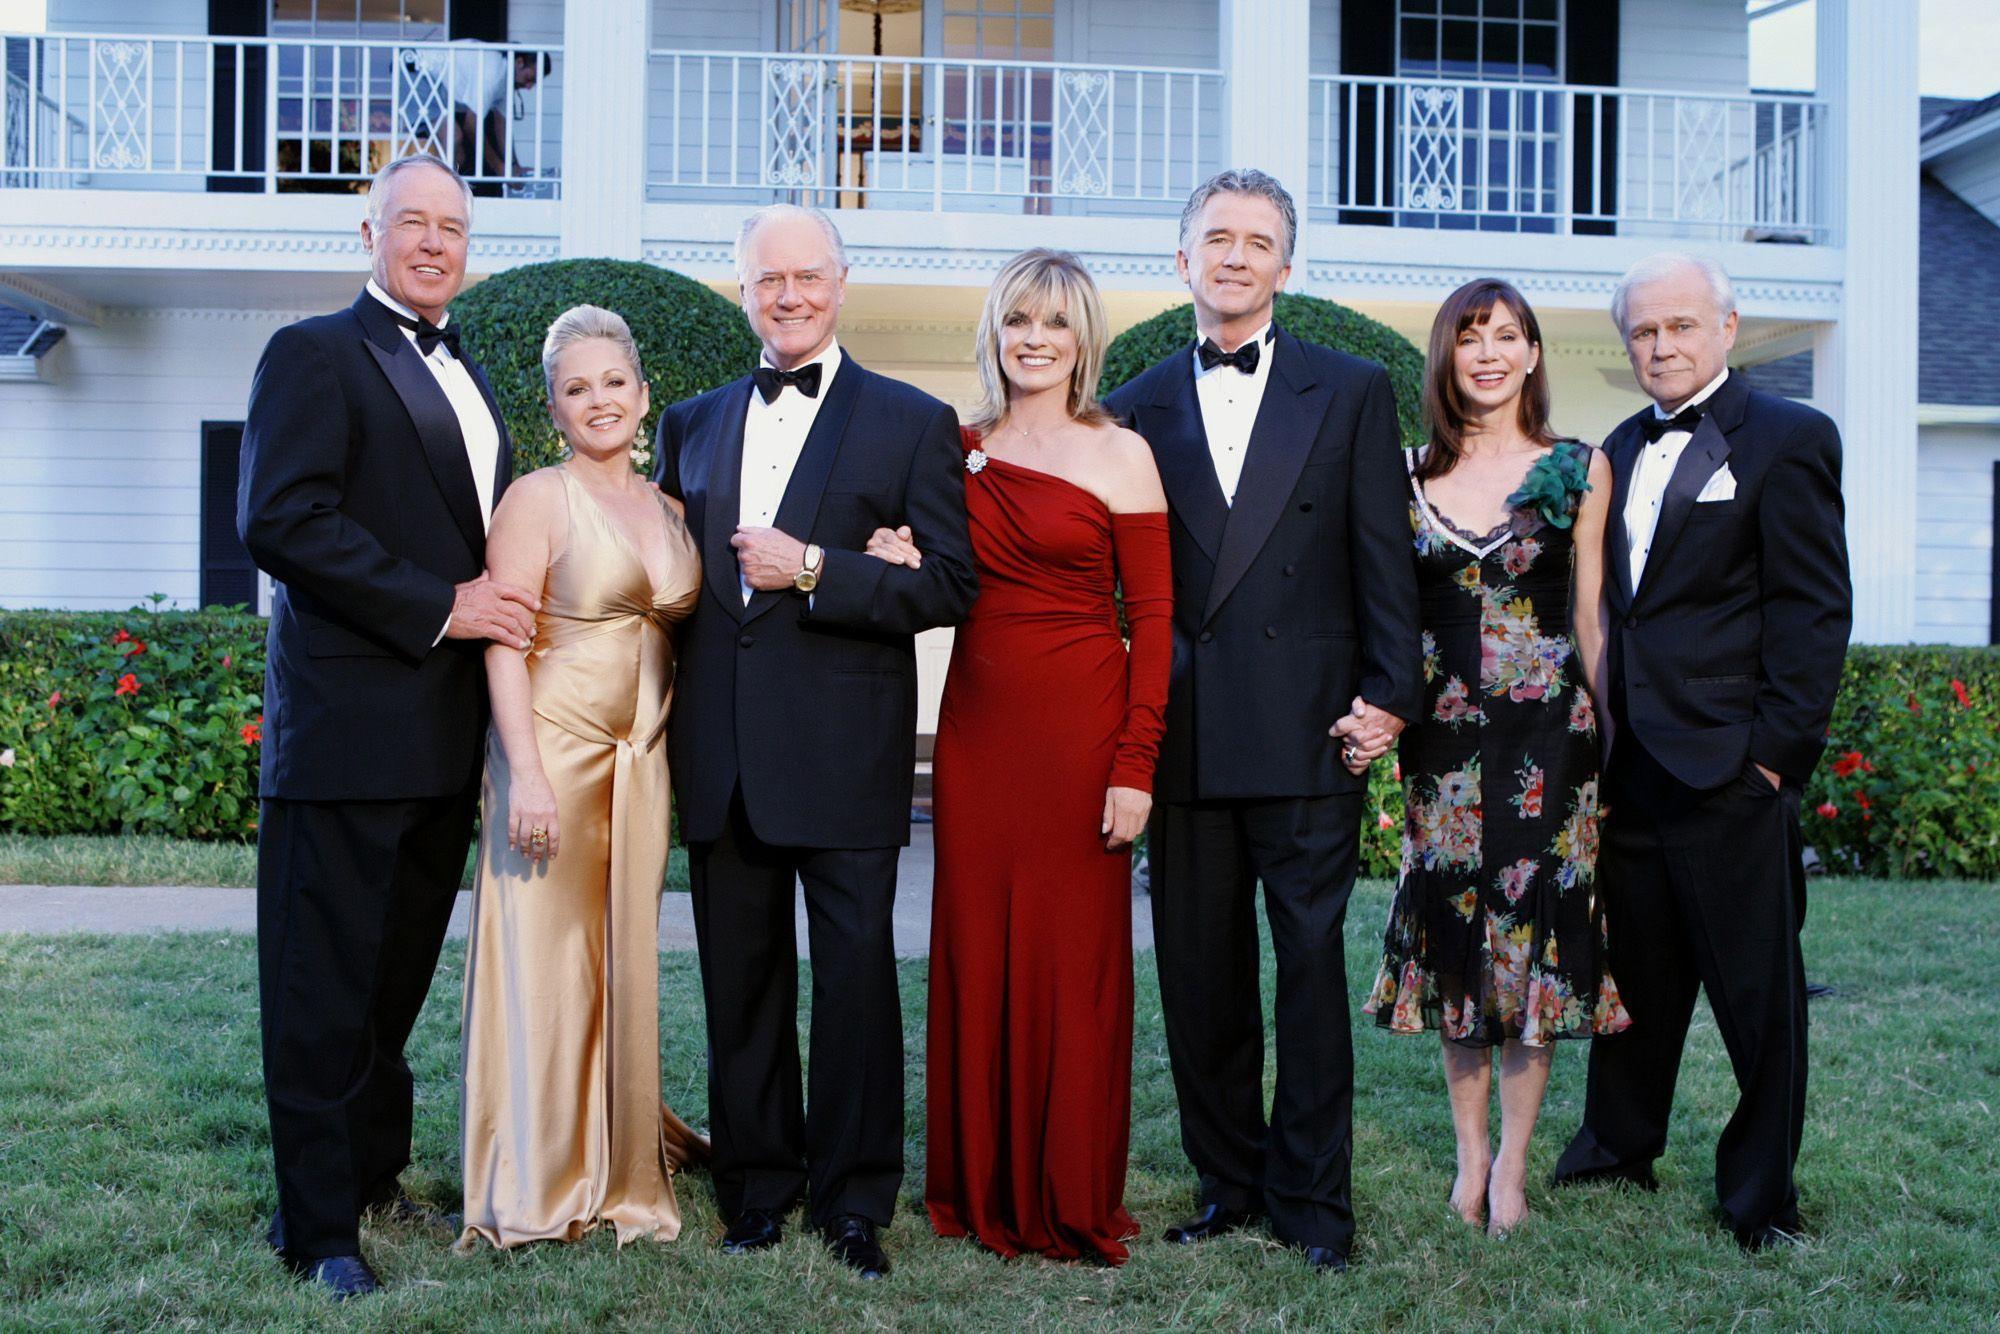 Victoria Principal, Patrick Duffy, Larry Hagman, Charlene Tilton, Linda Gray, Steve Kanaly, and Ken Kercheval in Dallas Reunion: Return to Southfork (2004)